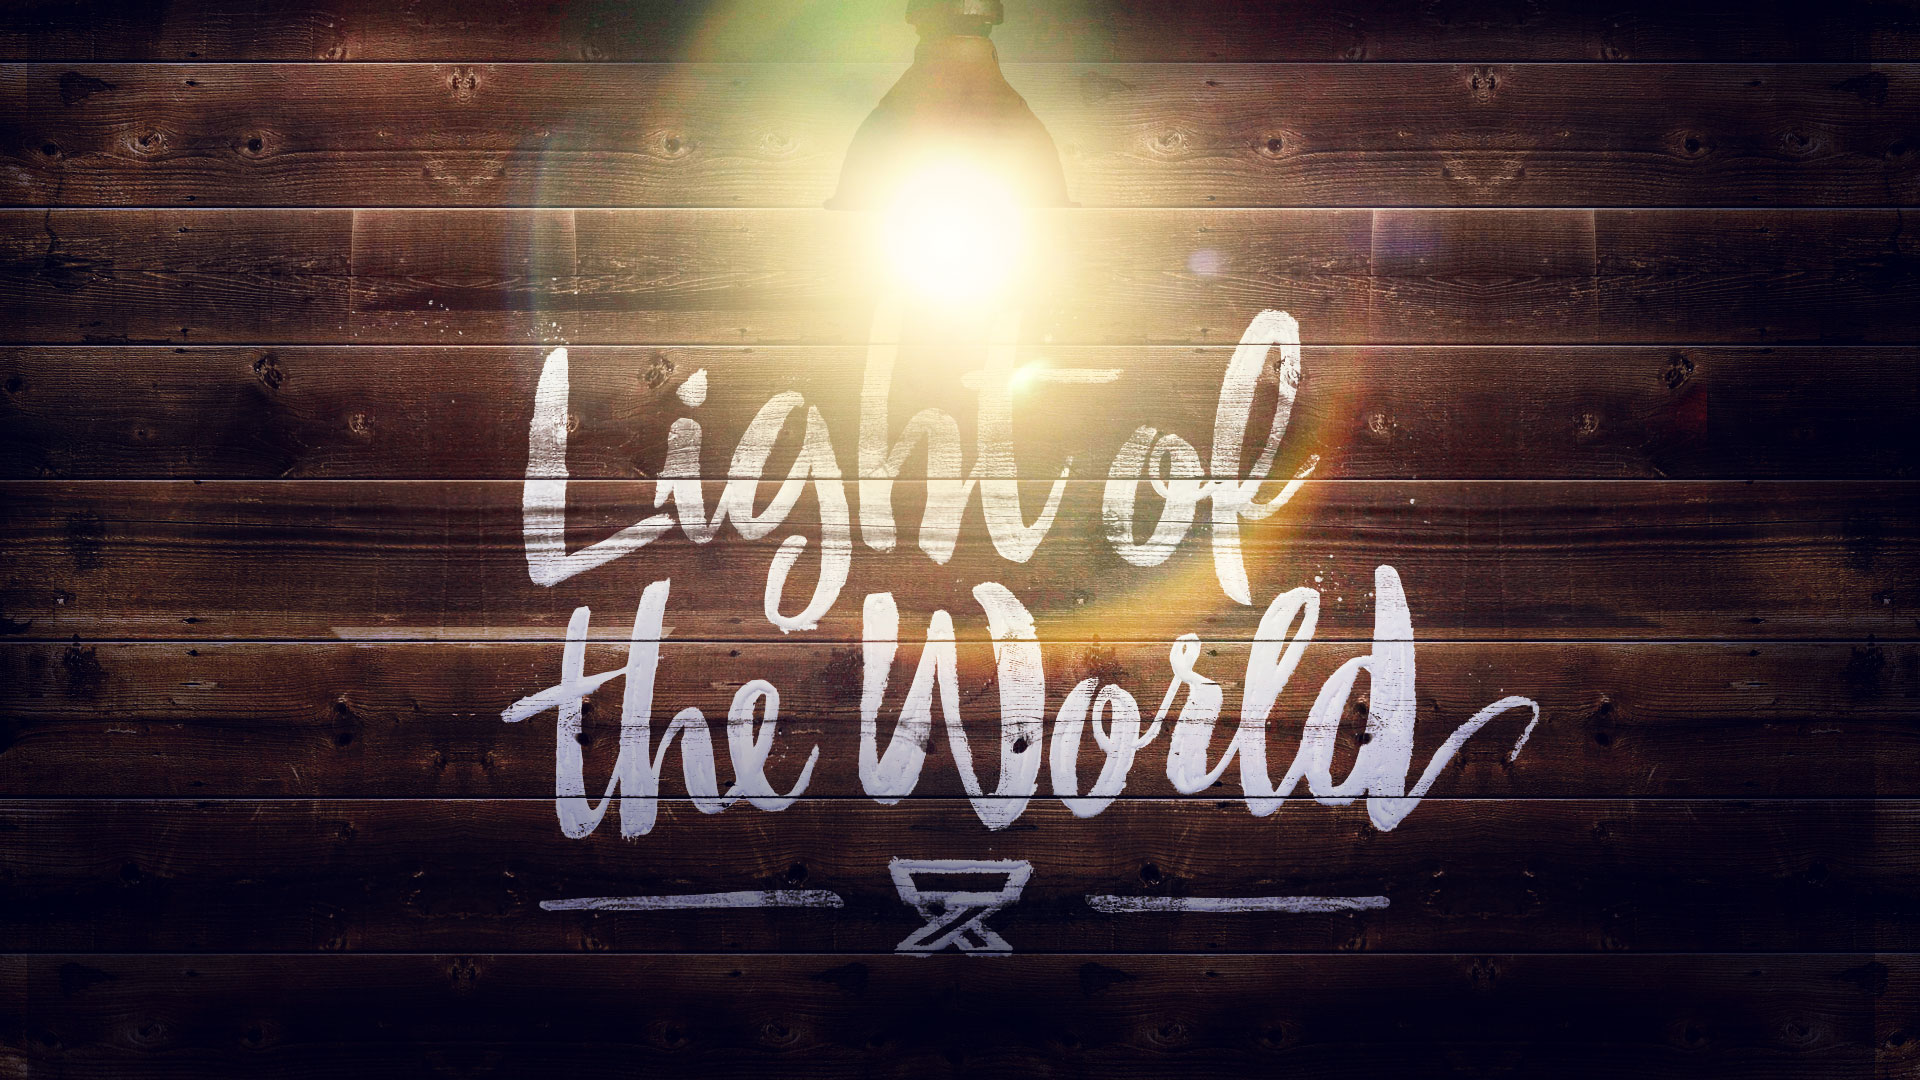 LightoftheWorld_TITLE.jpg